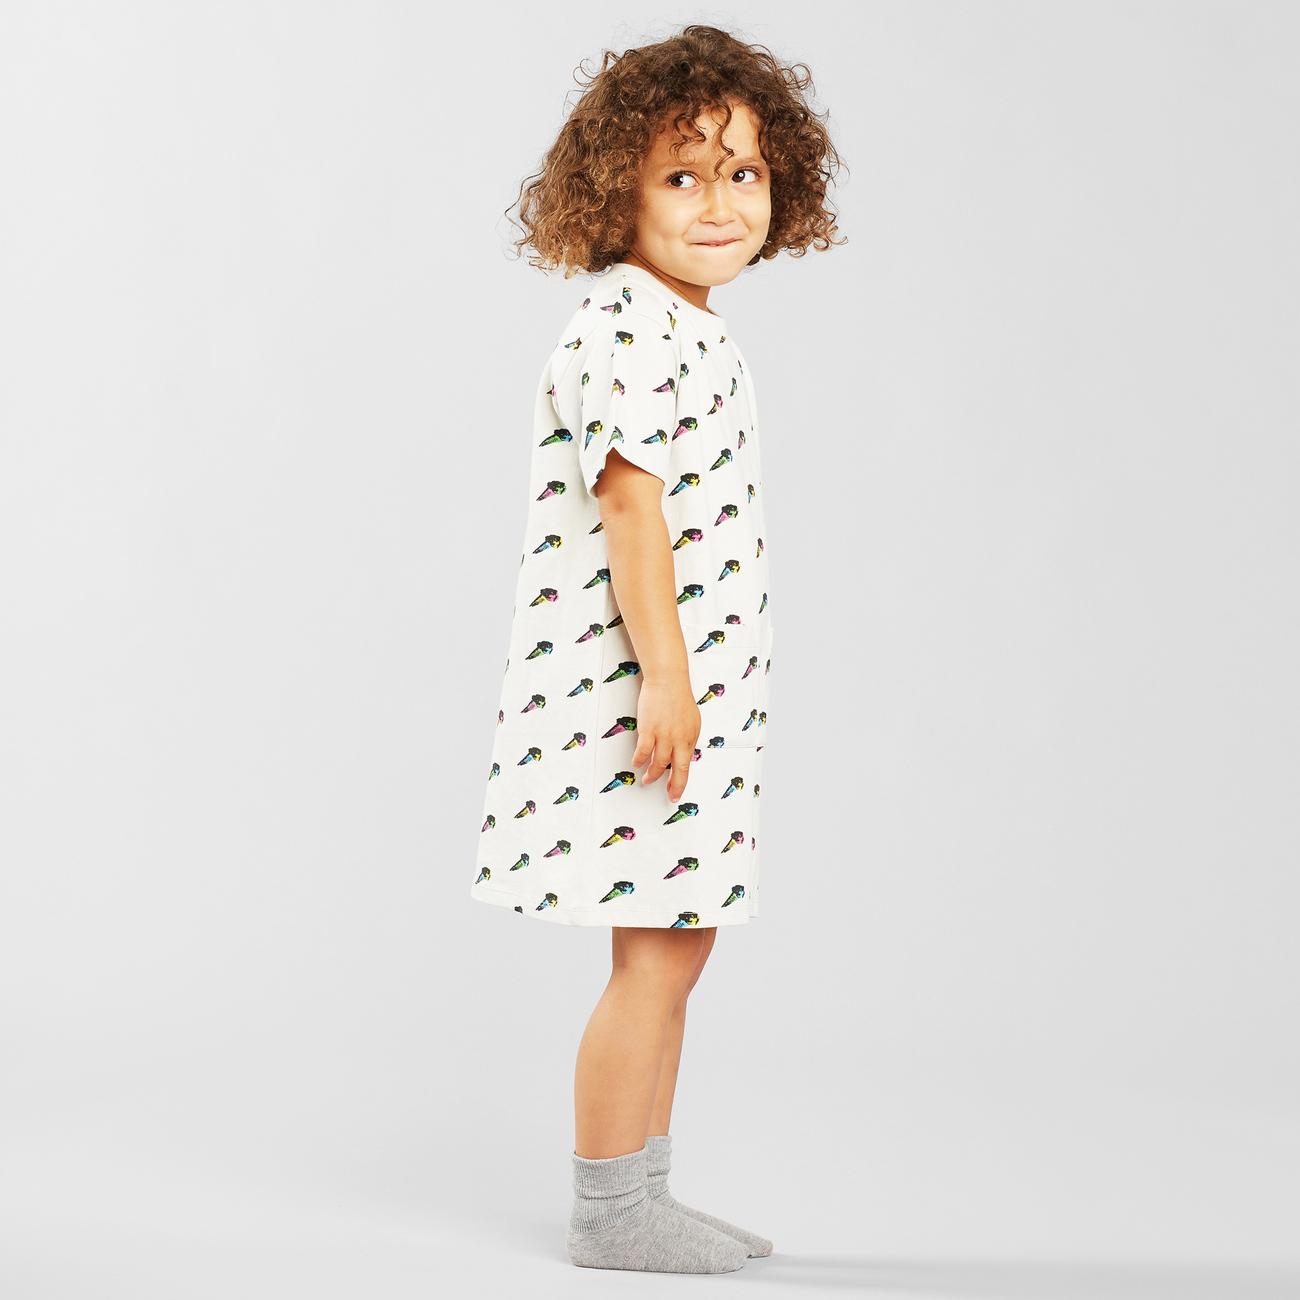 T-shirt Dress Vetlanda Pop Ice Cream Light Grey